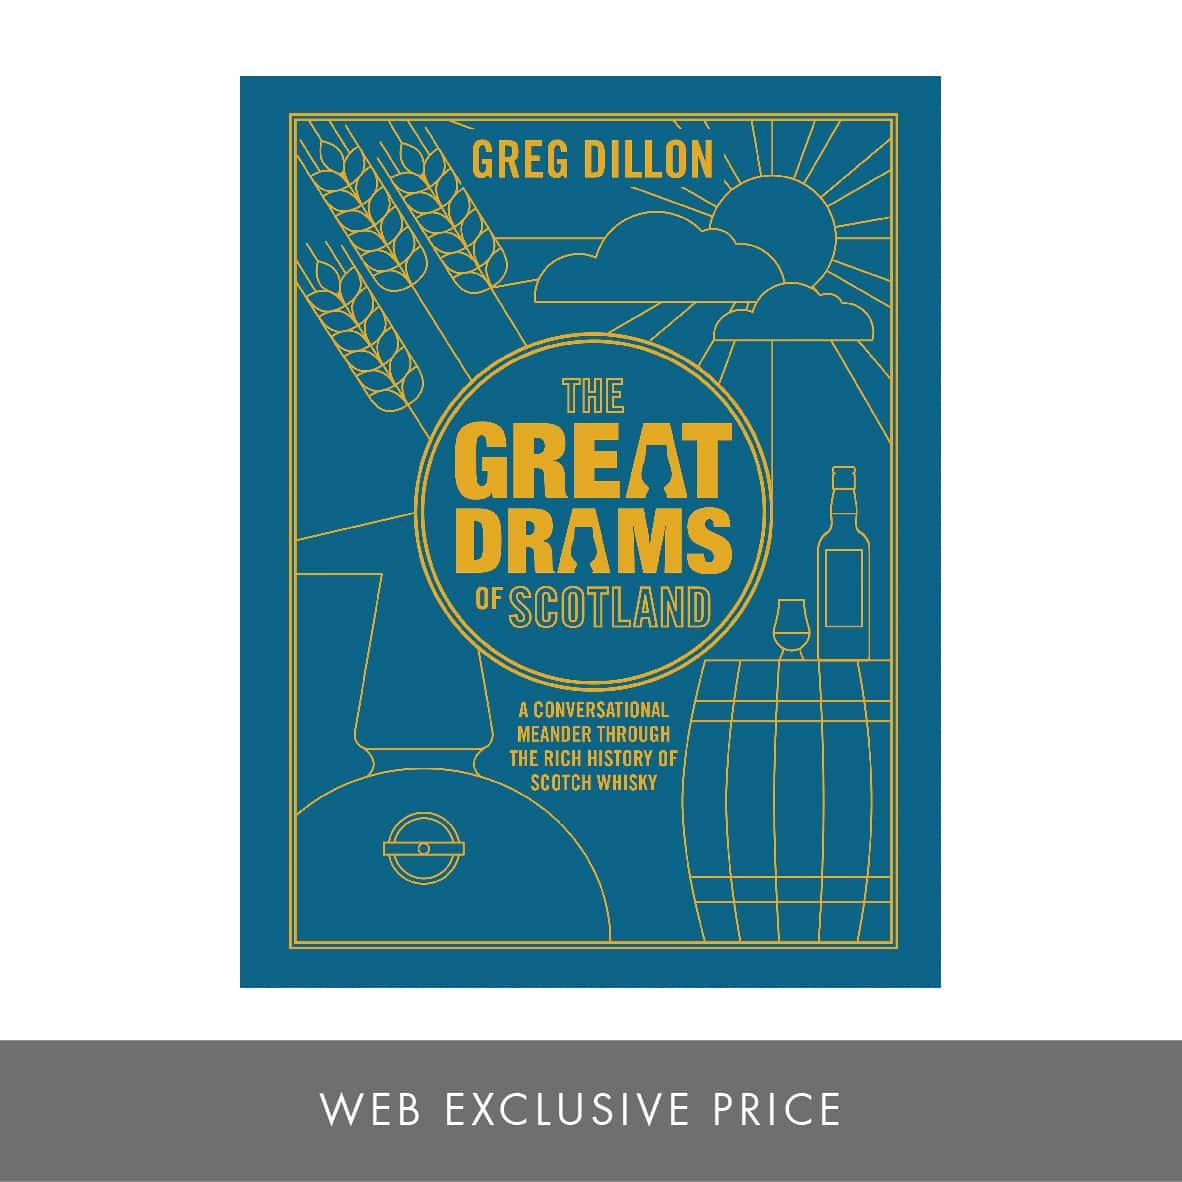 The GreatDrams of Scotland book, by Greg Dillon